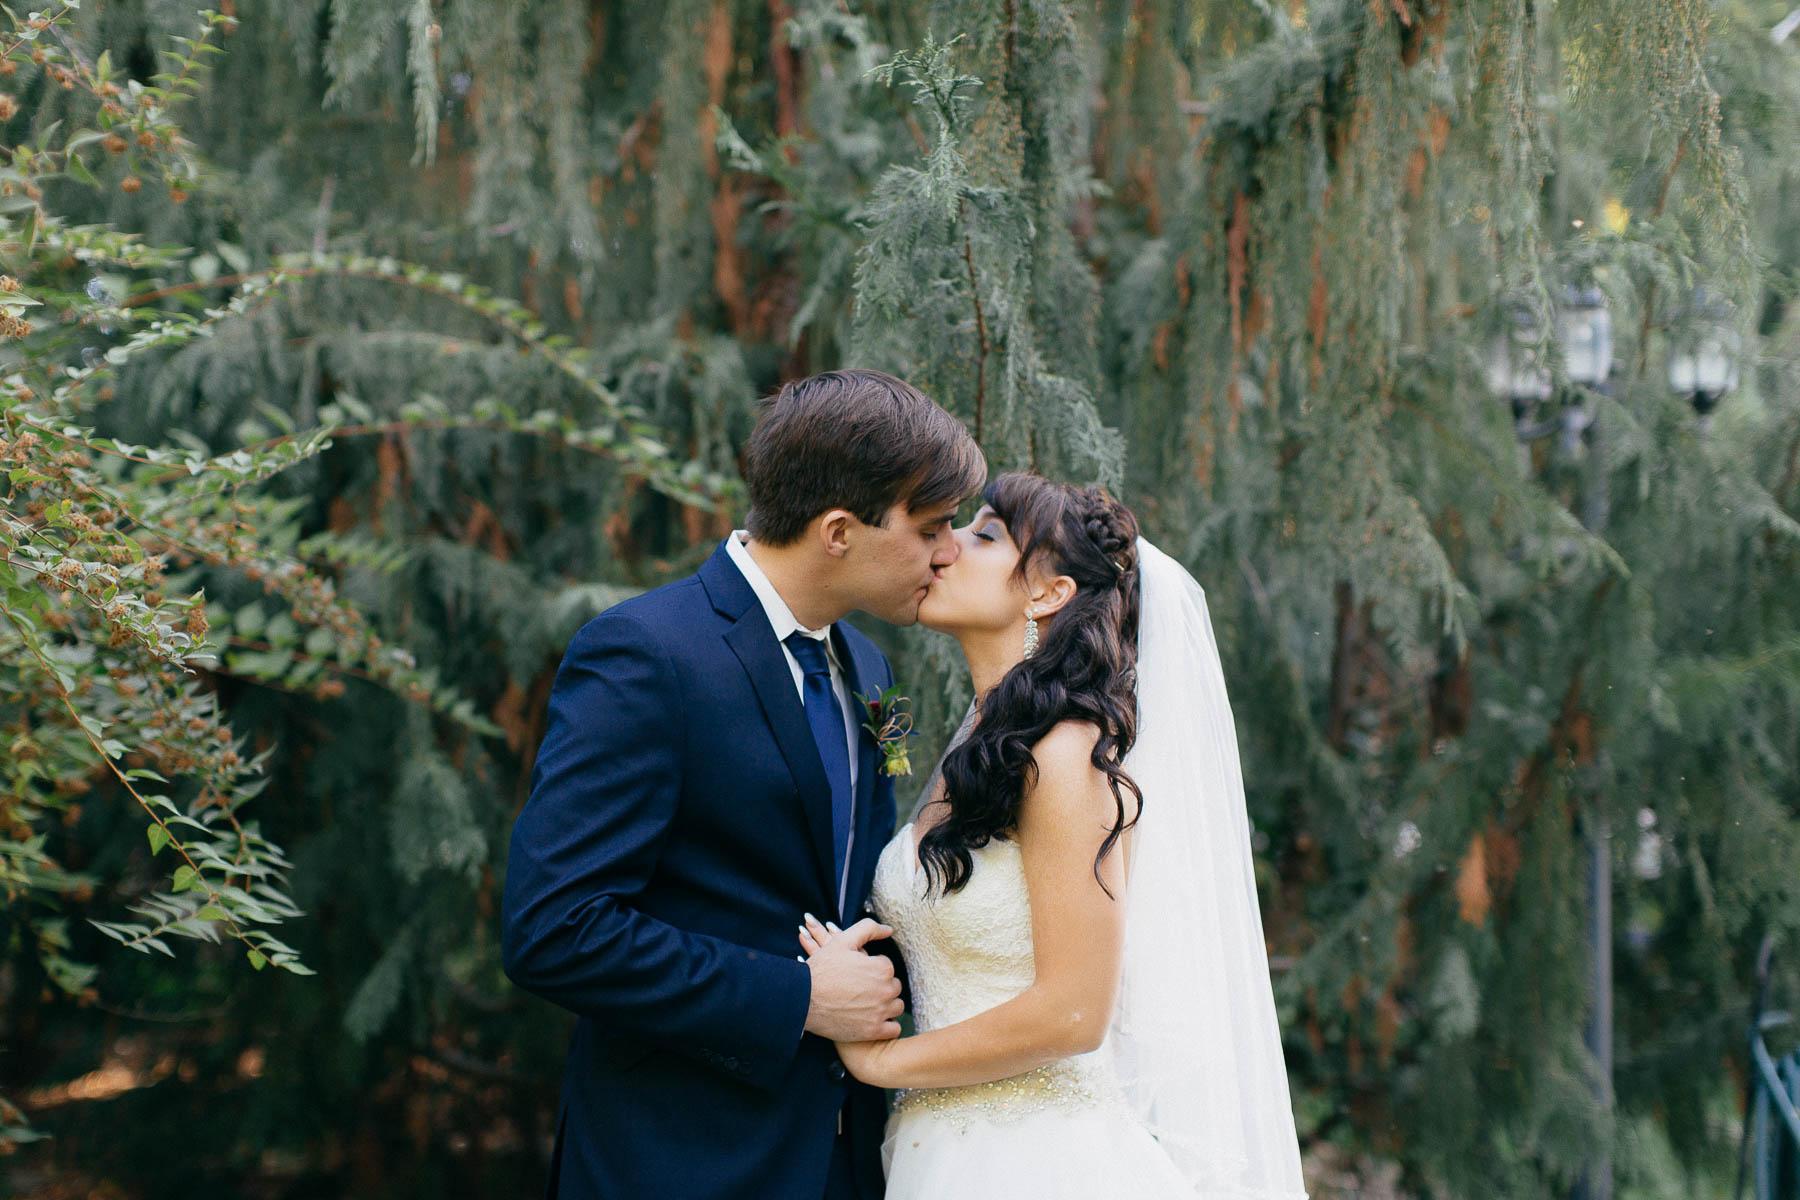 20161022-Matt-Le-Photography-October-2016-Tyler-Ashtyn-Wedding-square-6997.jpg